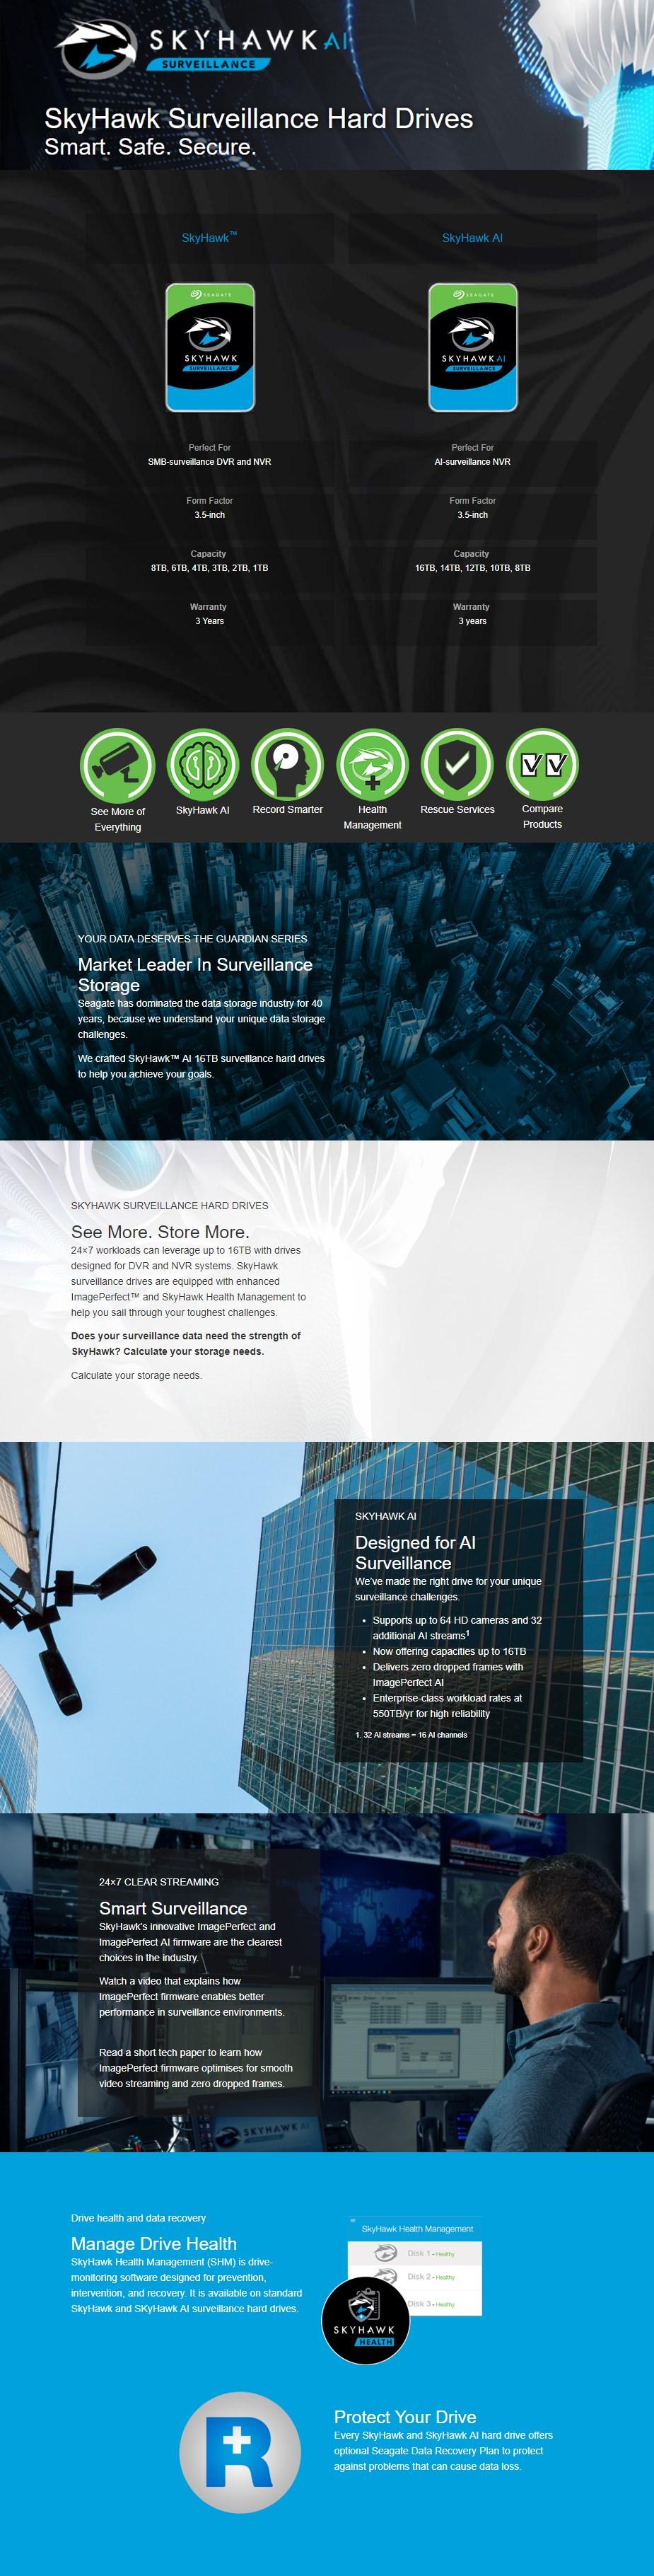 "Seagate ST14000VE0008 14TB SkyHawk AI 3.5"" Surveillance Hard Drive - Overview 1"